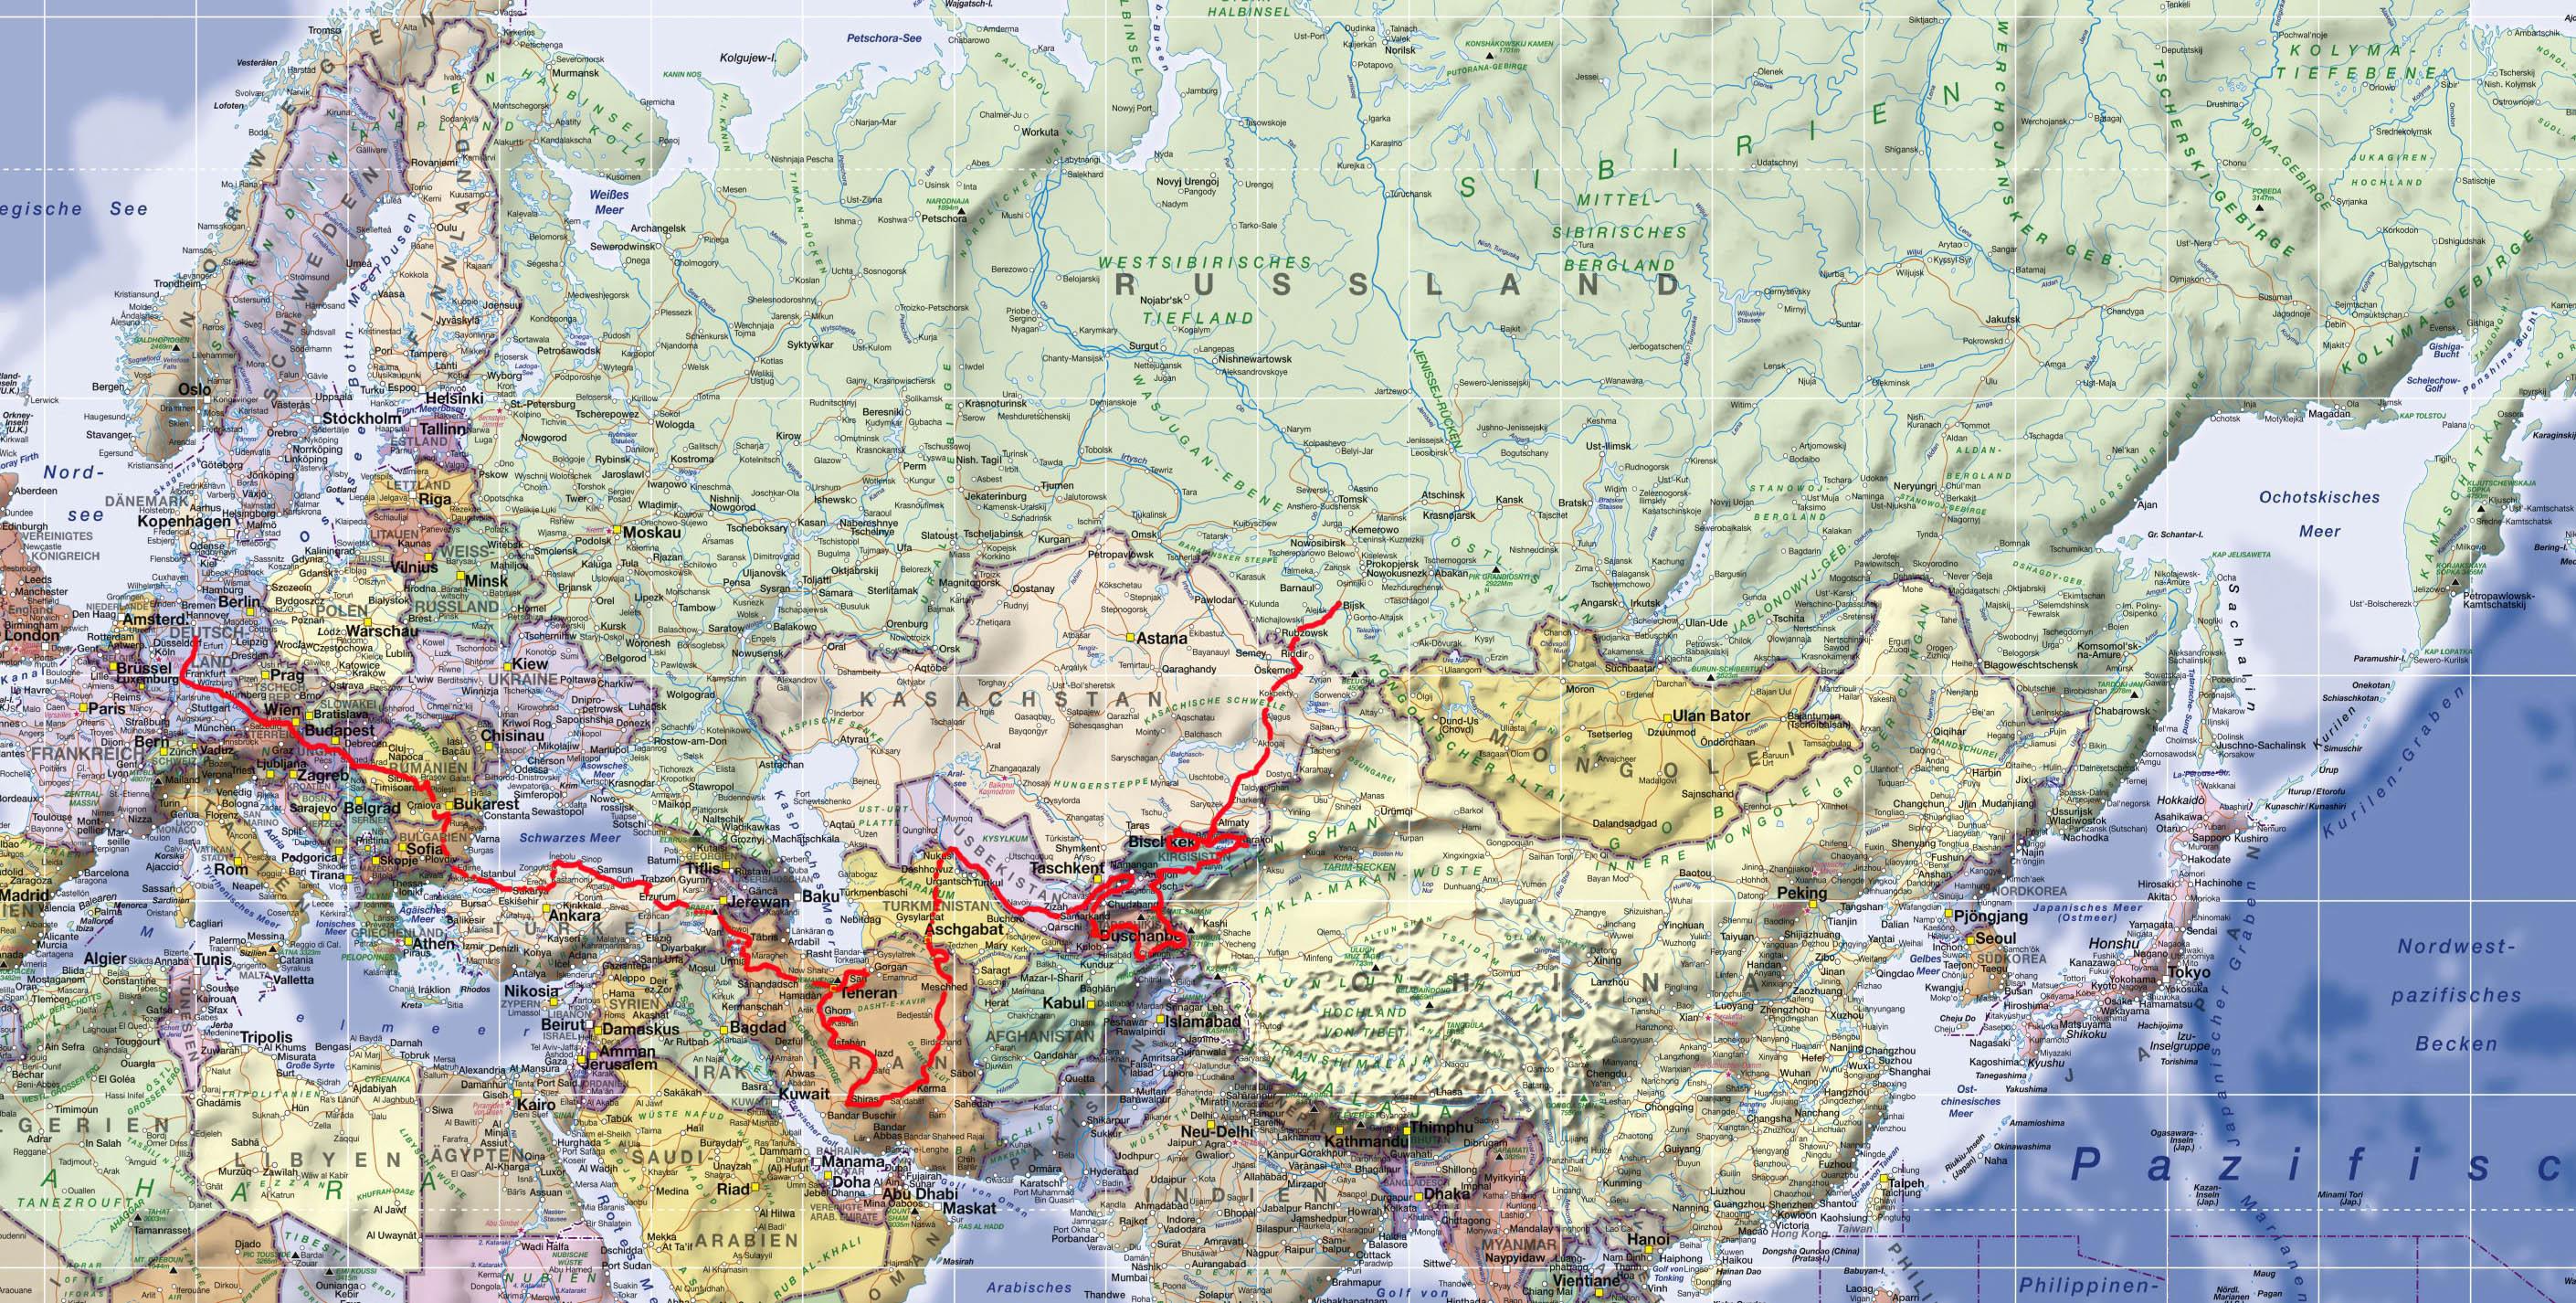 Seidenstraße bis Magadan Aktuel web 20.08.